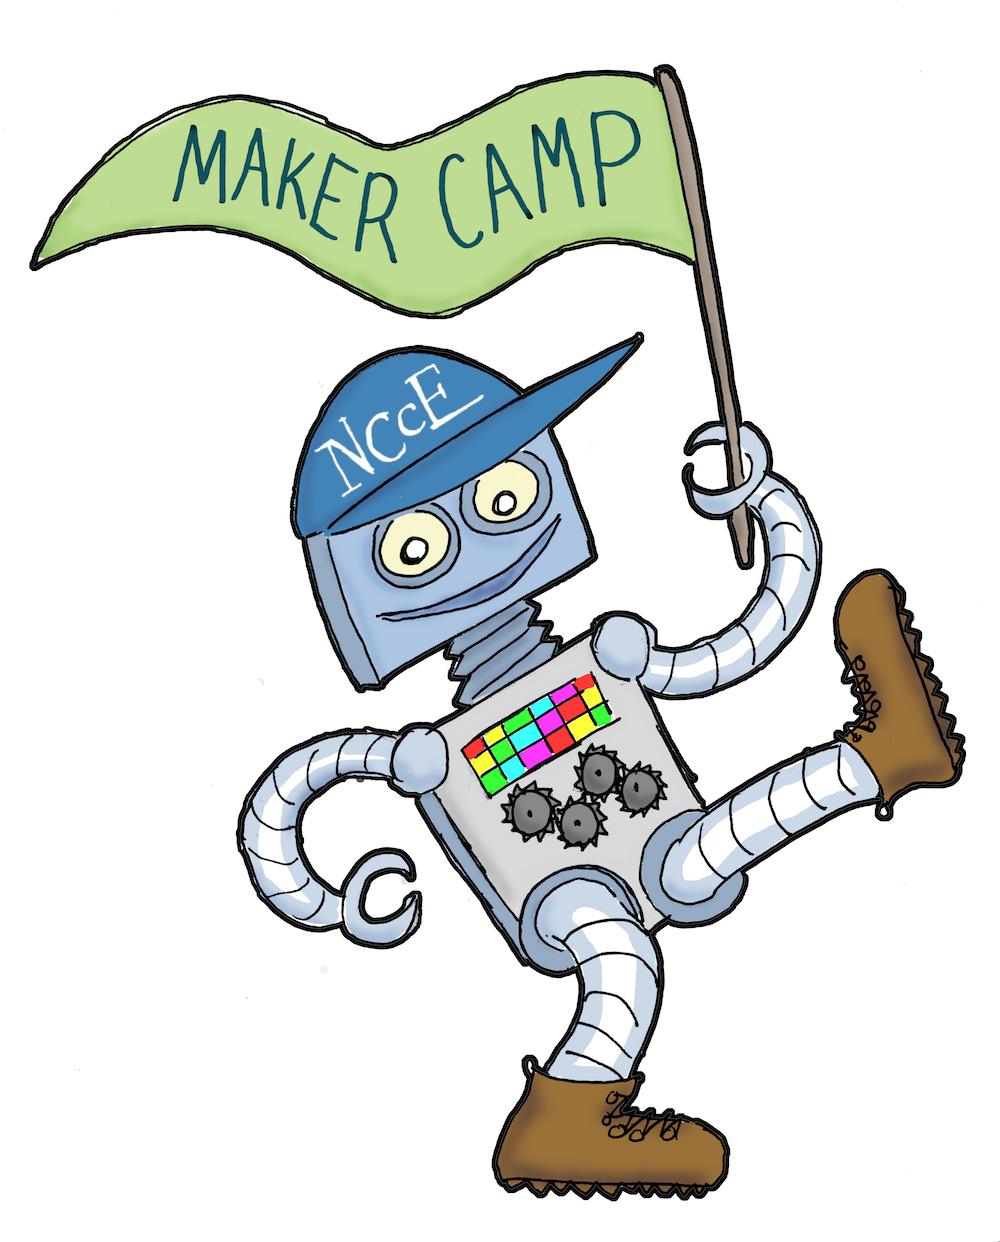 Maker Camp Mascot